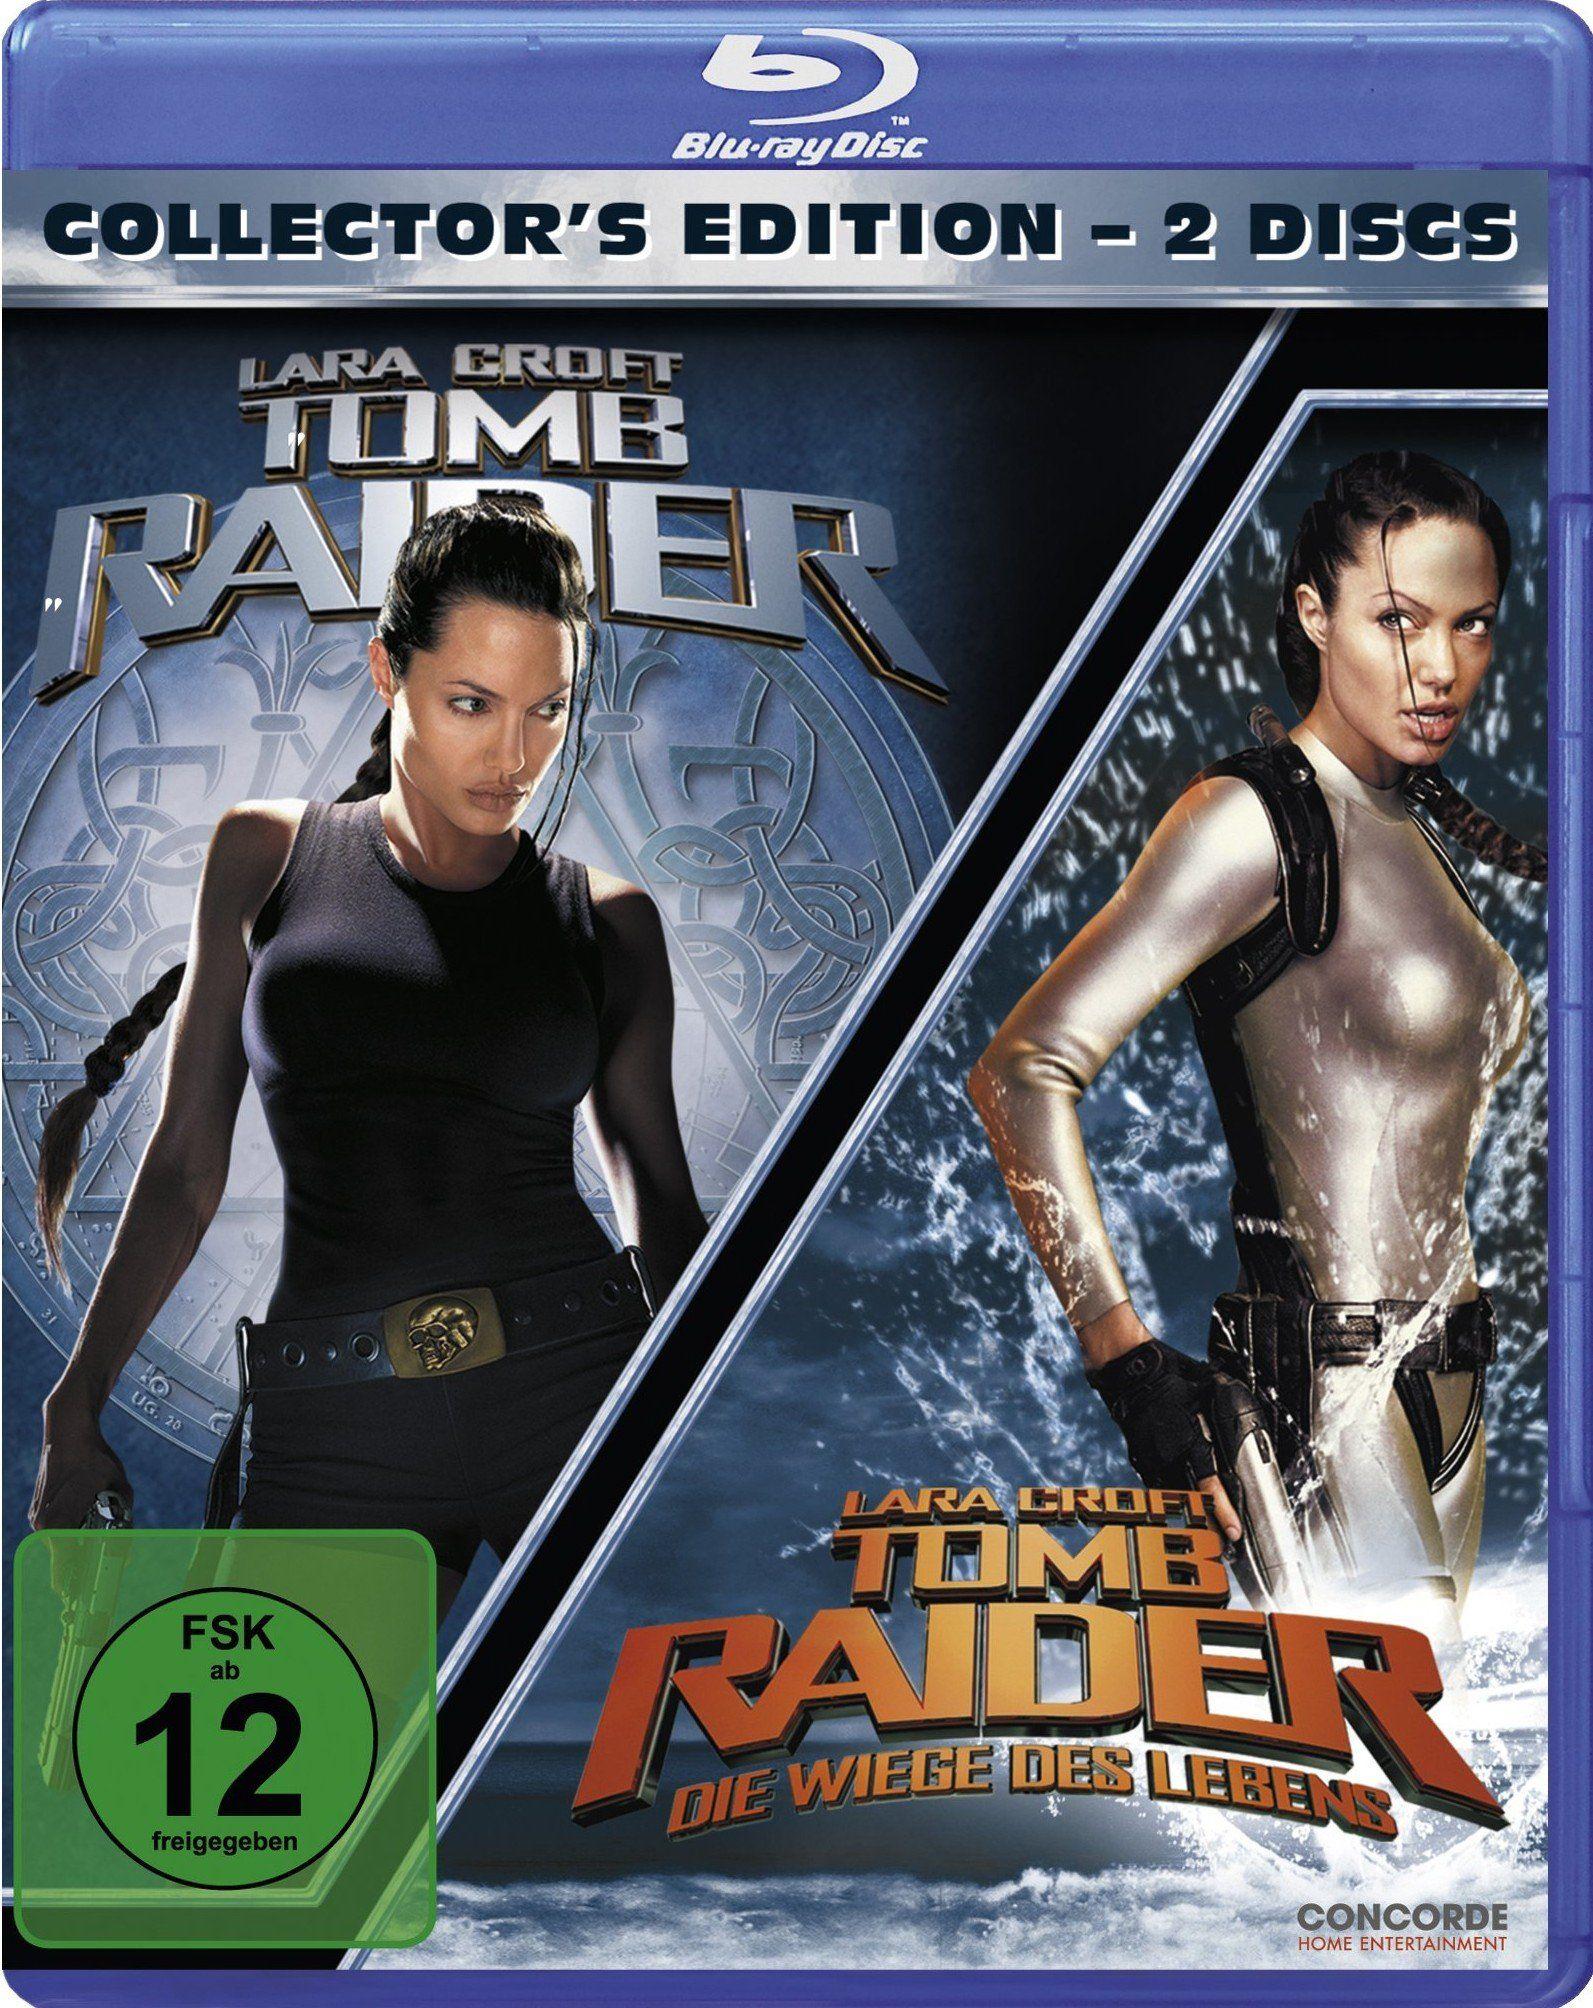 Lara Croft Tomb Raider 1 2 Lara Croft Tomb Raider 1 Lara Croft